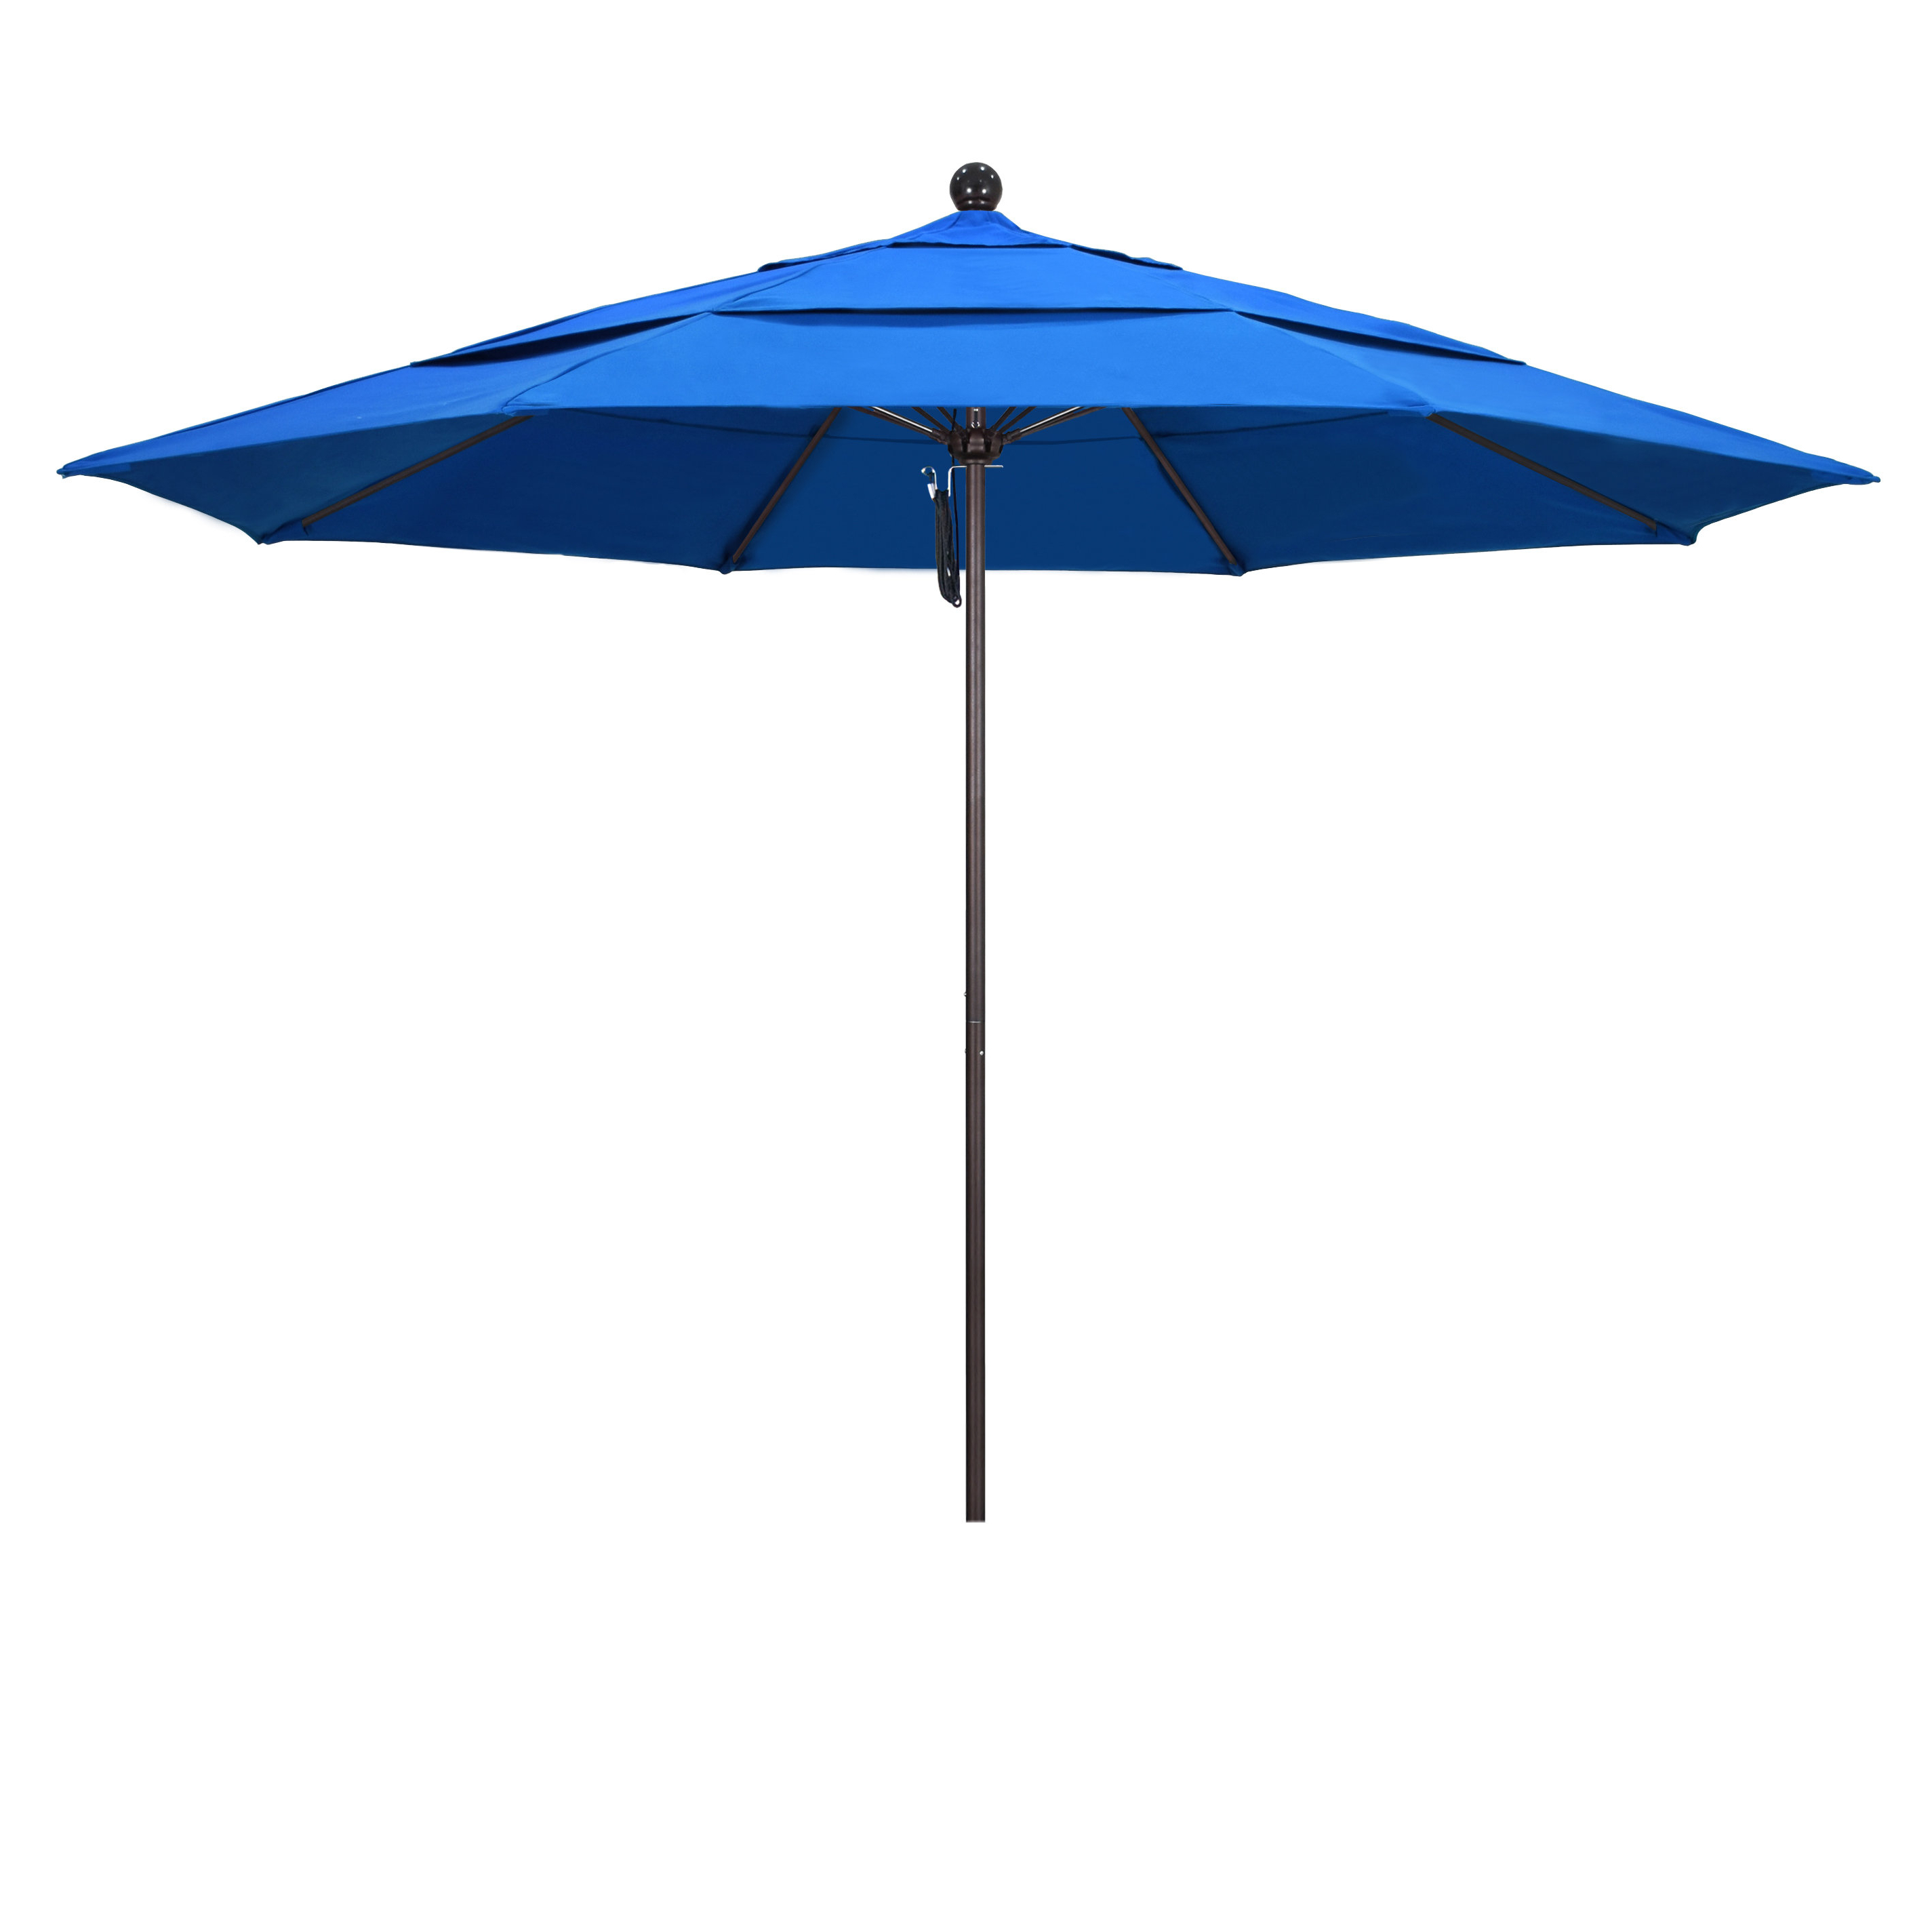 Caravelle Market Sunbrella Umbrellas Regarding Most Up To Date Benson 11' Market Umbrella (View 8 of 20)